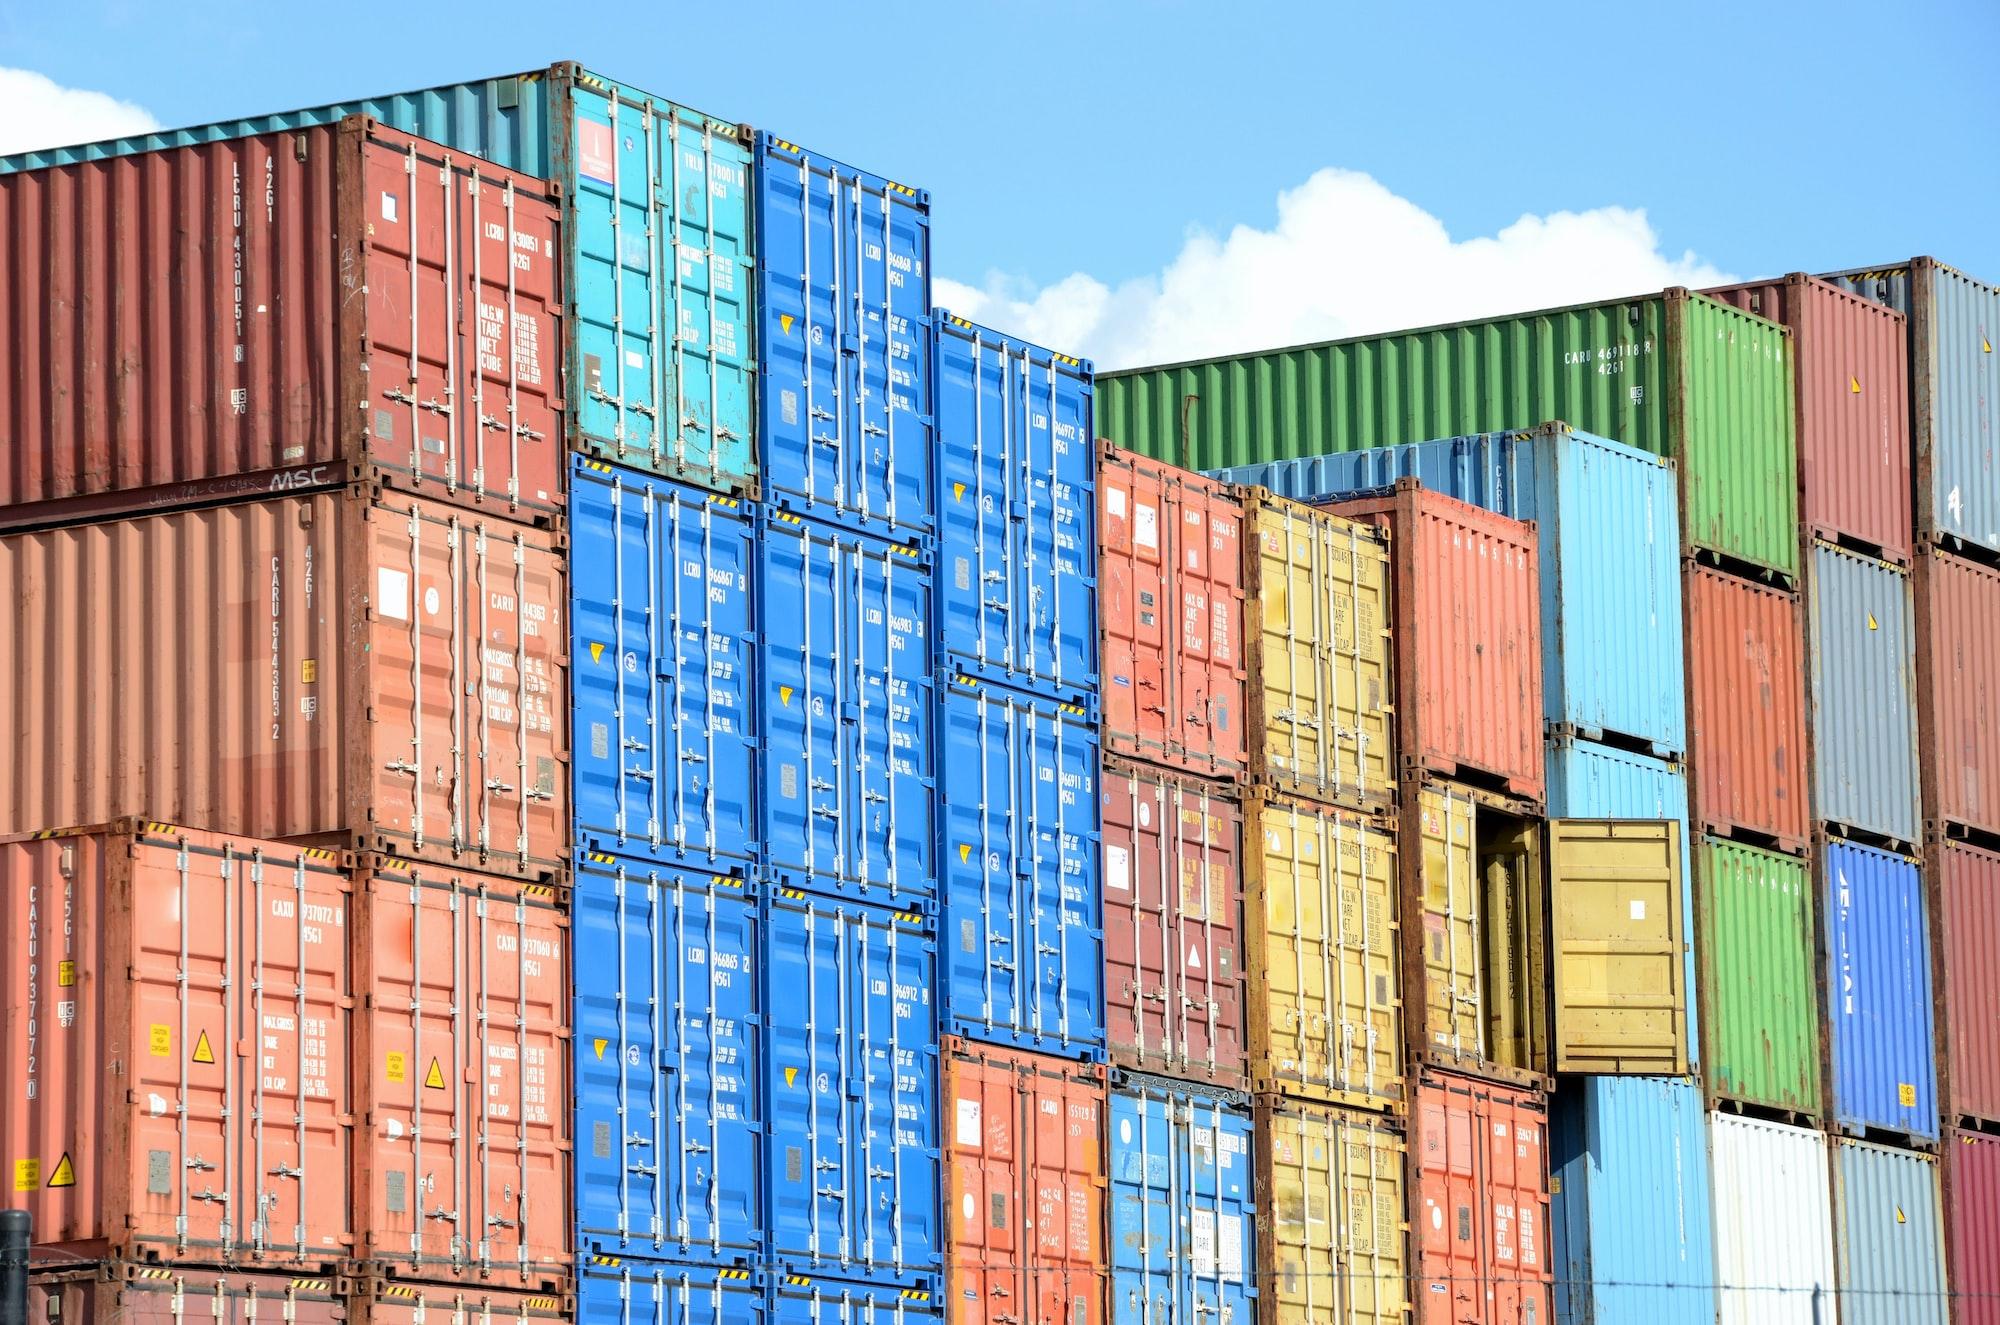 ECGC में 4400 करोड़ रुपये डालेगी भारत सरकार , निर्यातकों की बल्ले-बल्ले